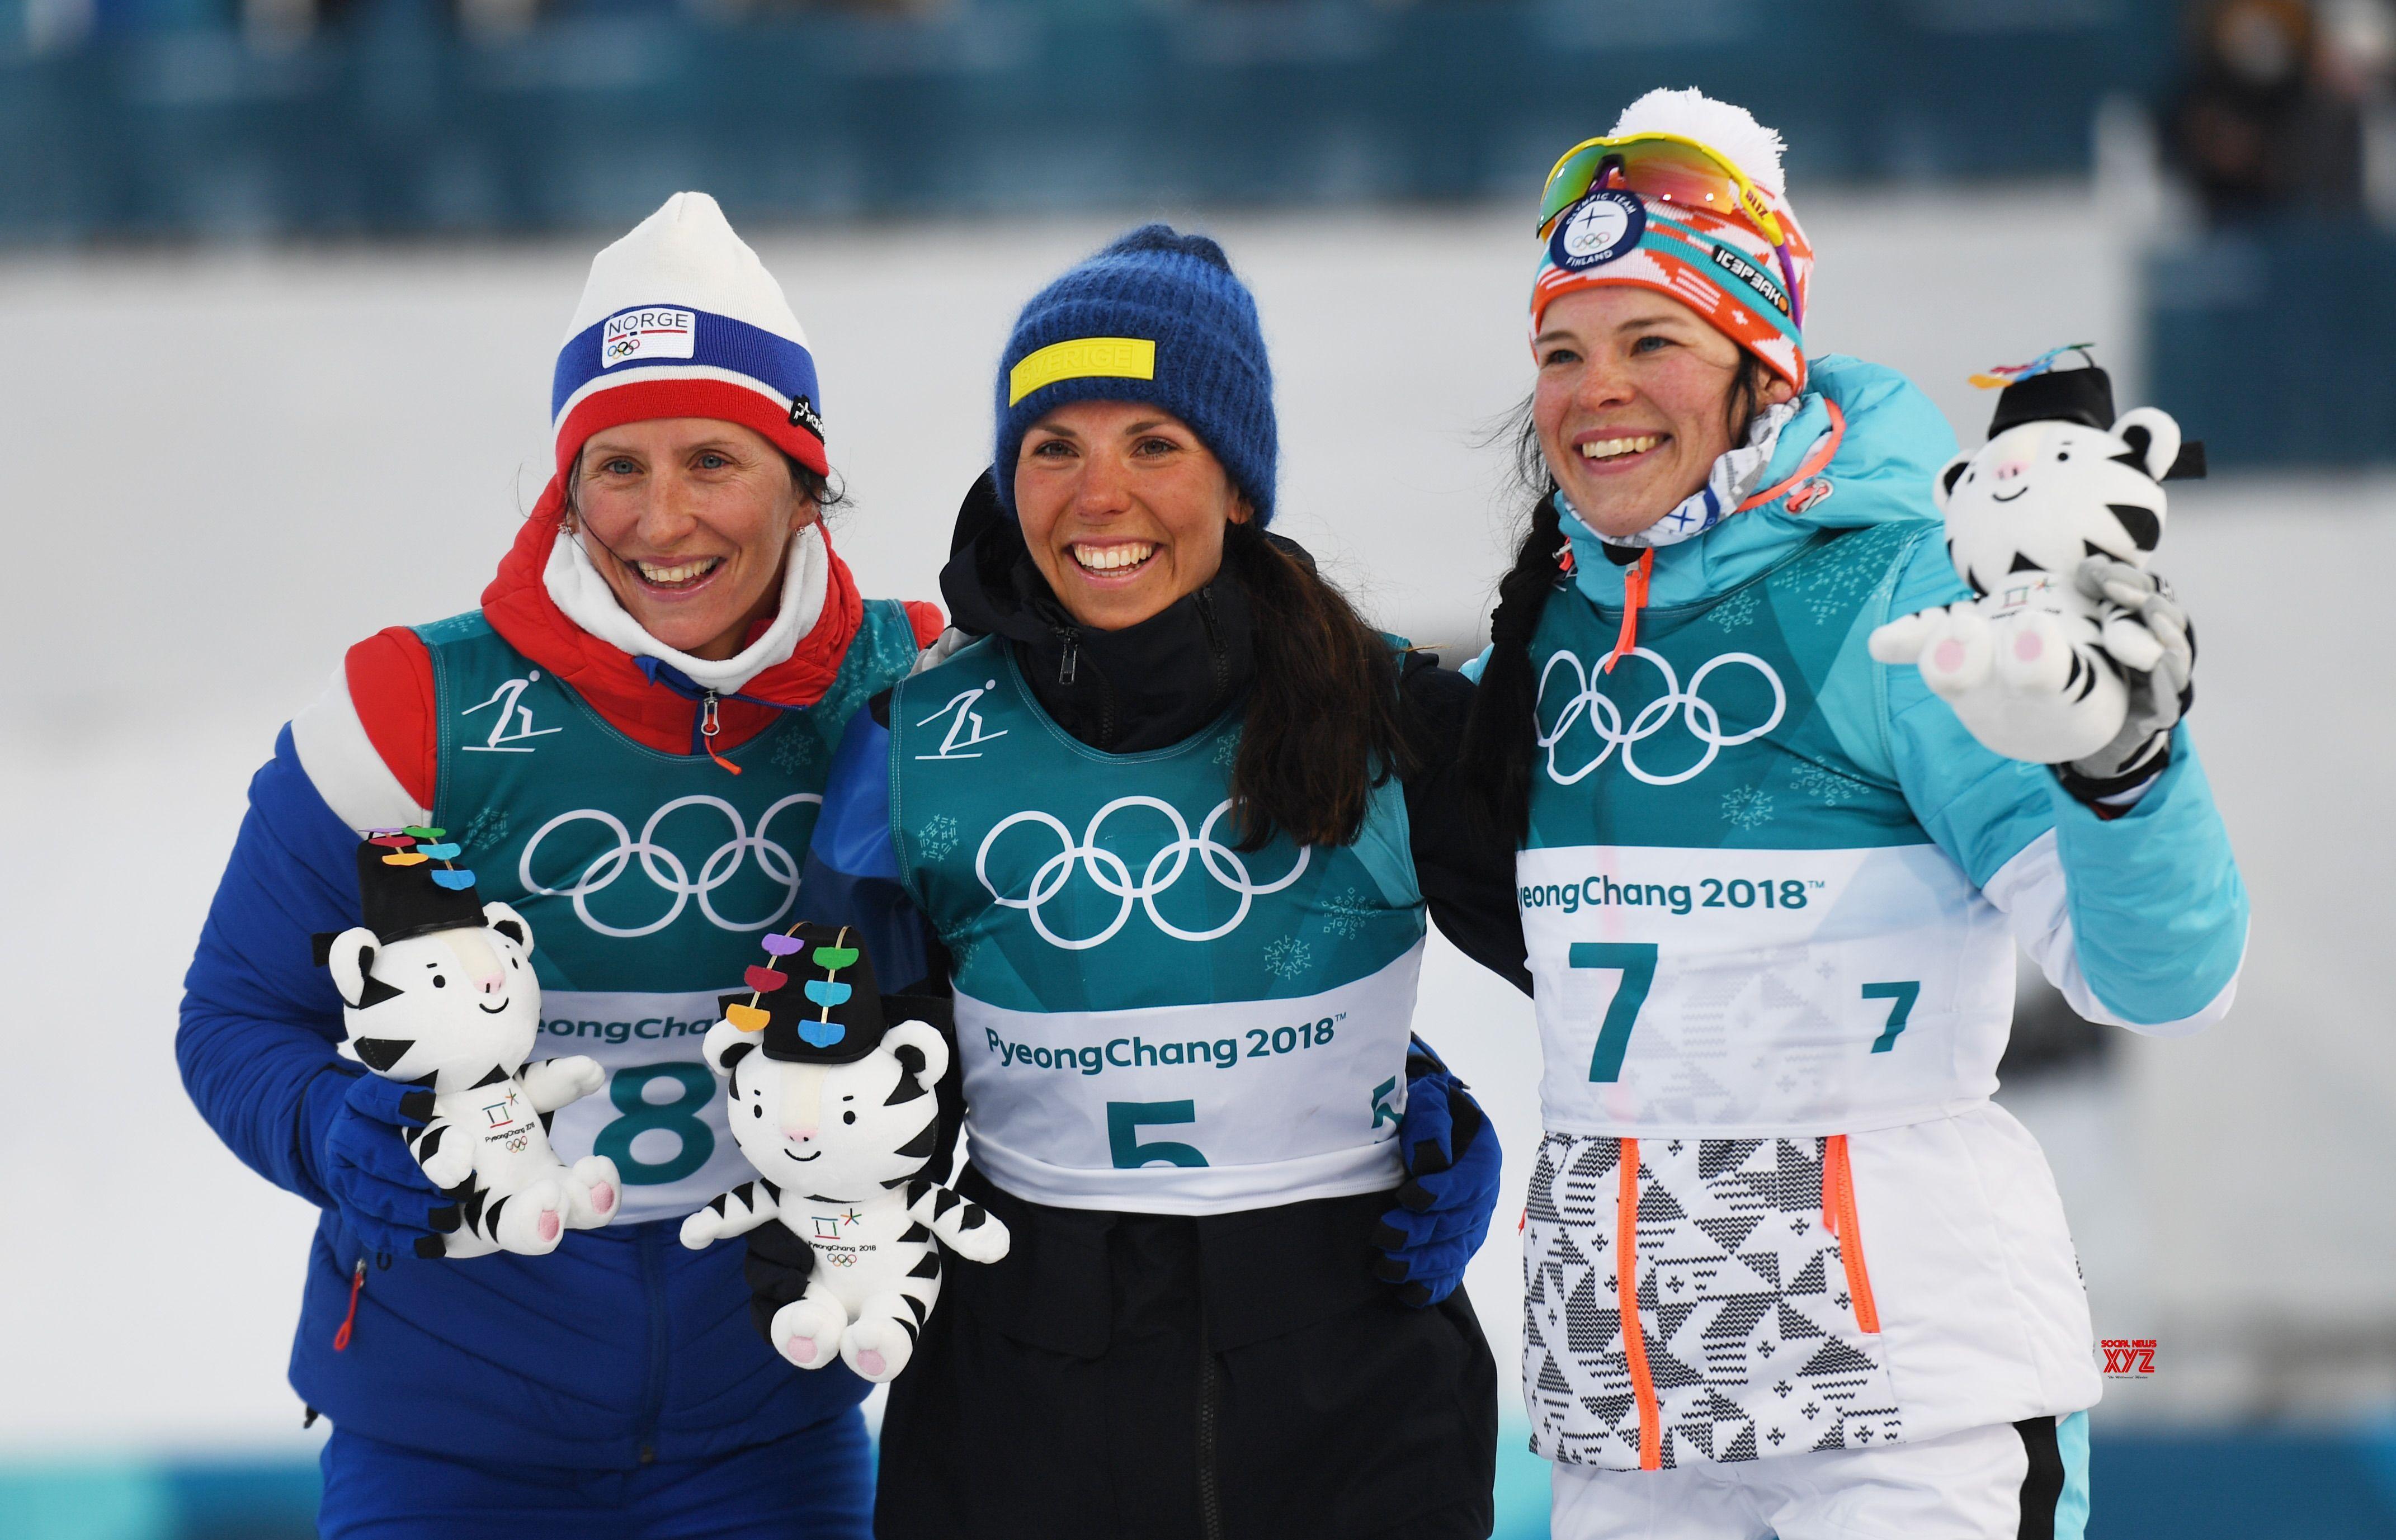 Oly South Korea Pyeongchang Cross Country Skiing Ladies 7 5km 7 5km Skiathlon Gallery Social News Xyz Winter Olympics Cross Country Skiing 2018 Winter Olympics